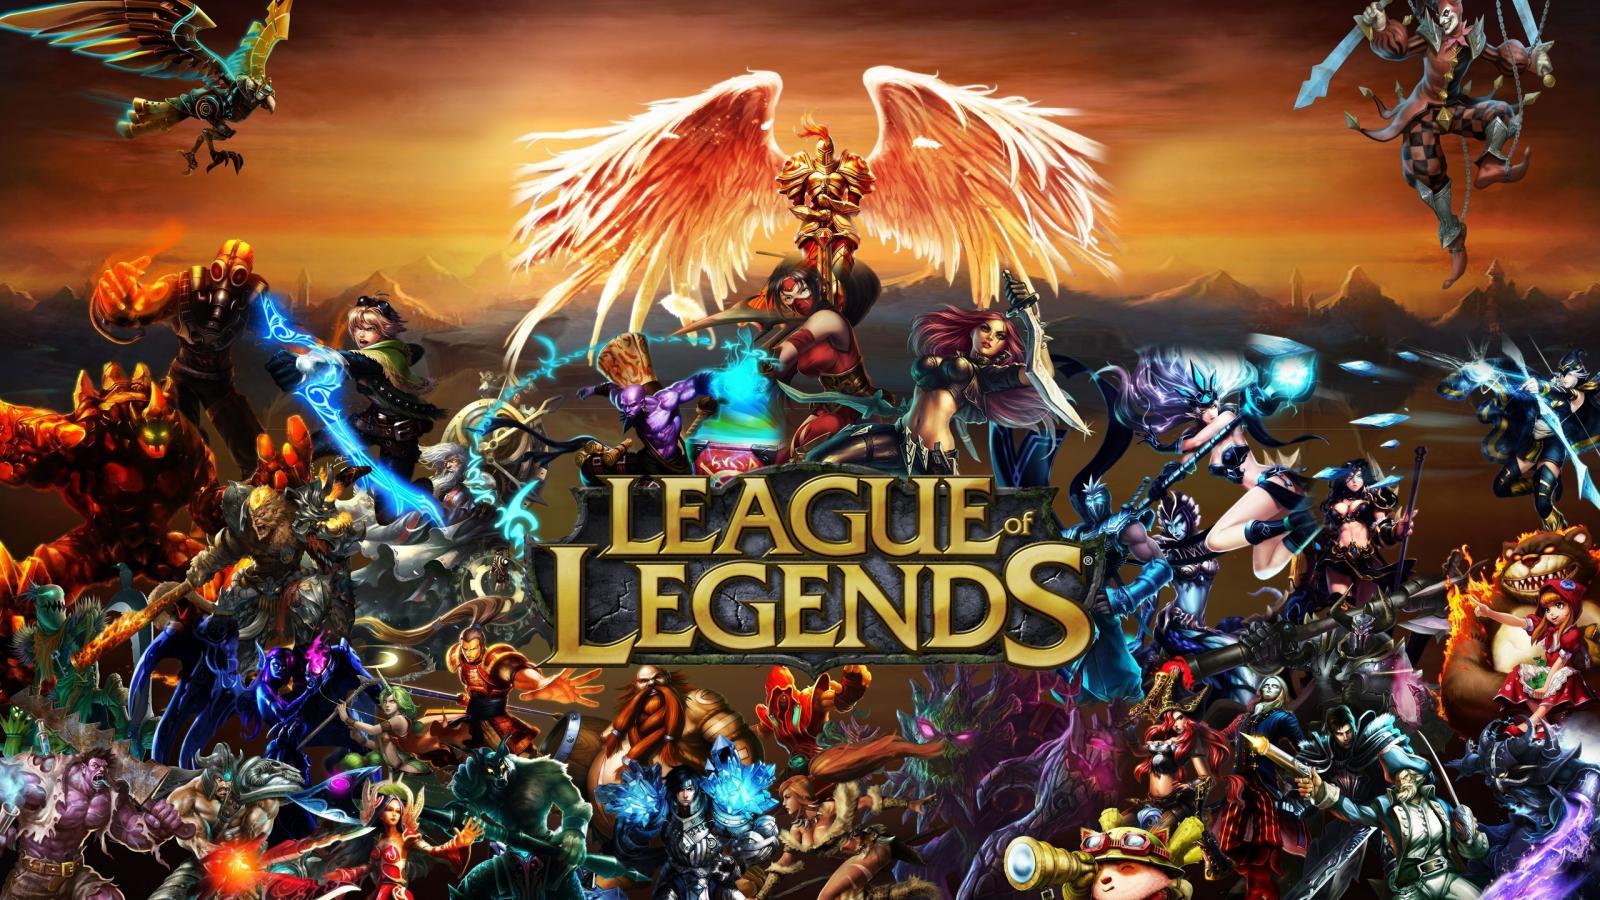 League of Legends matchmaking prendendo per sempre